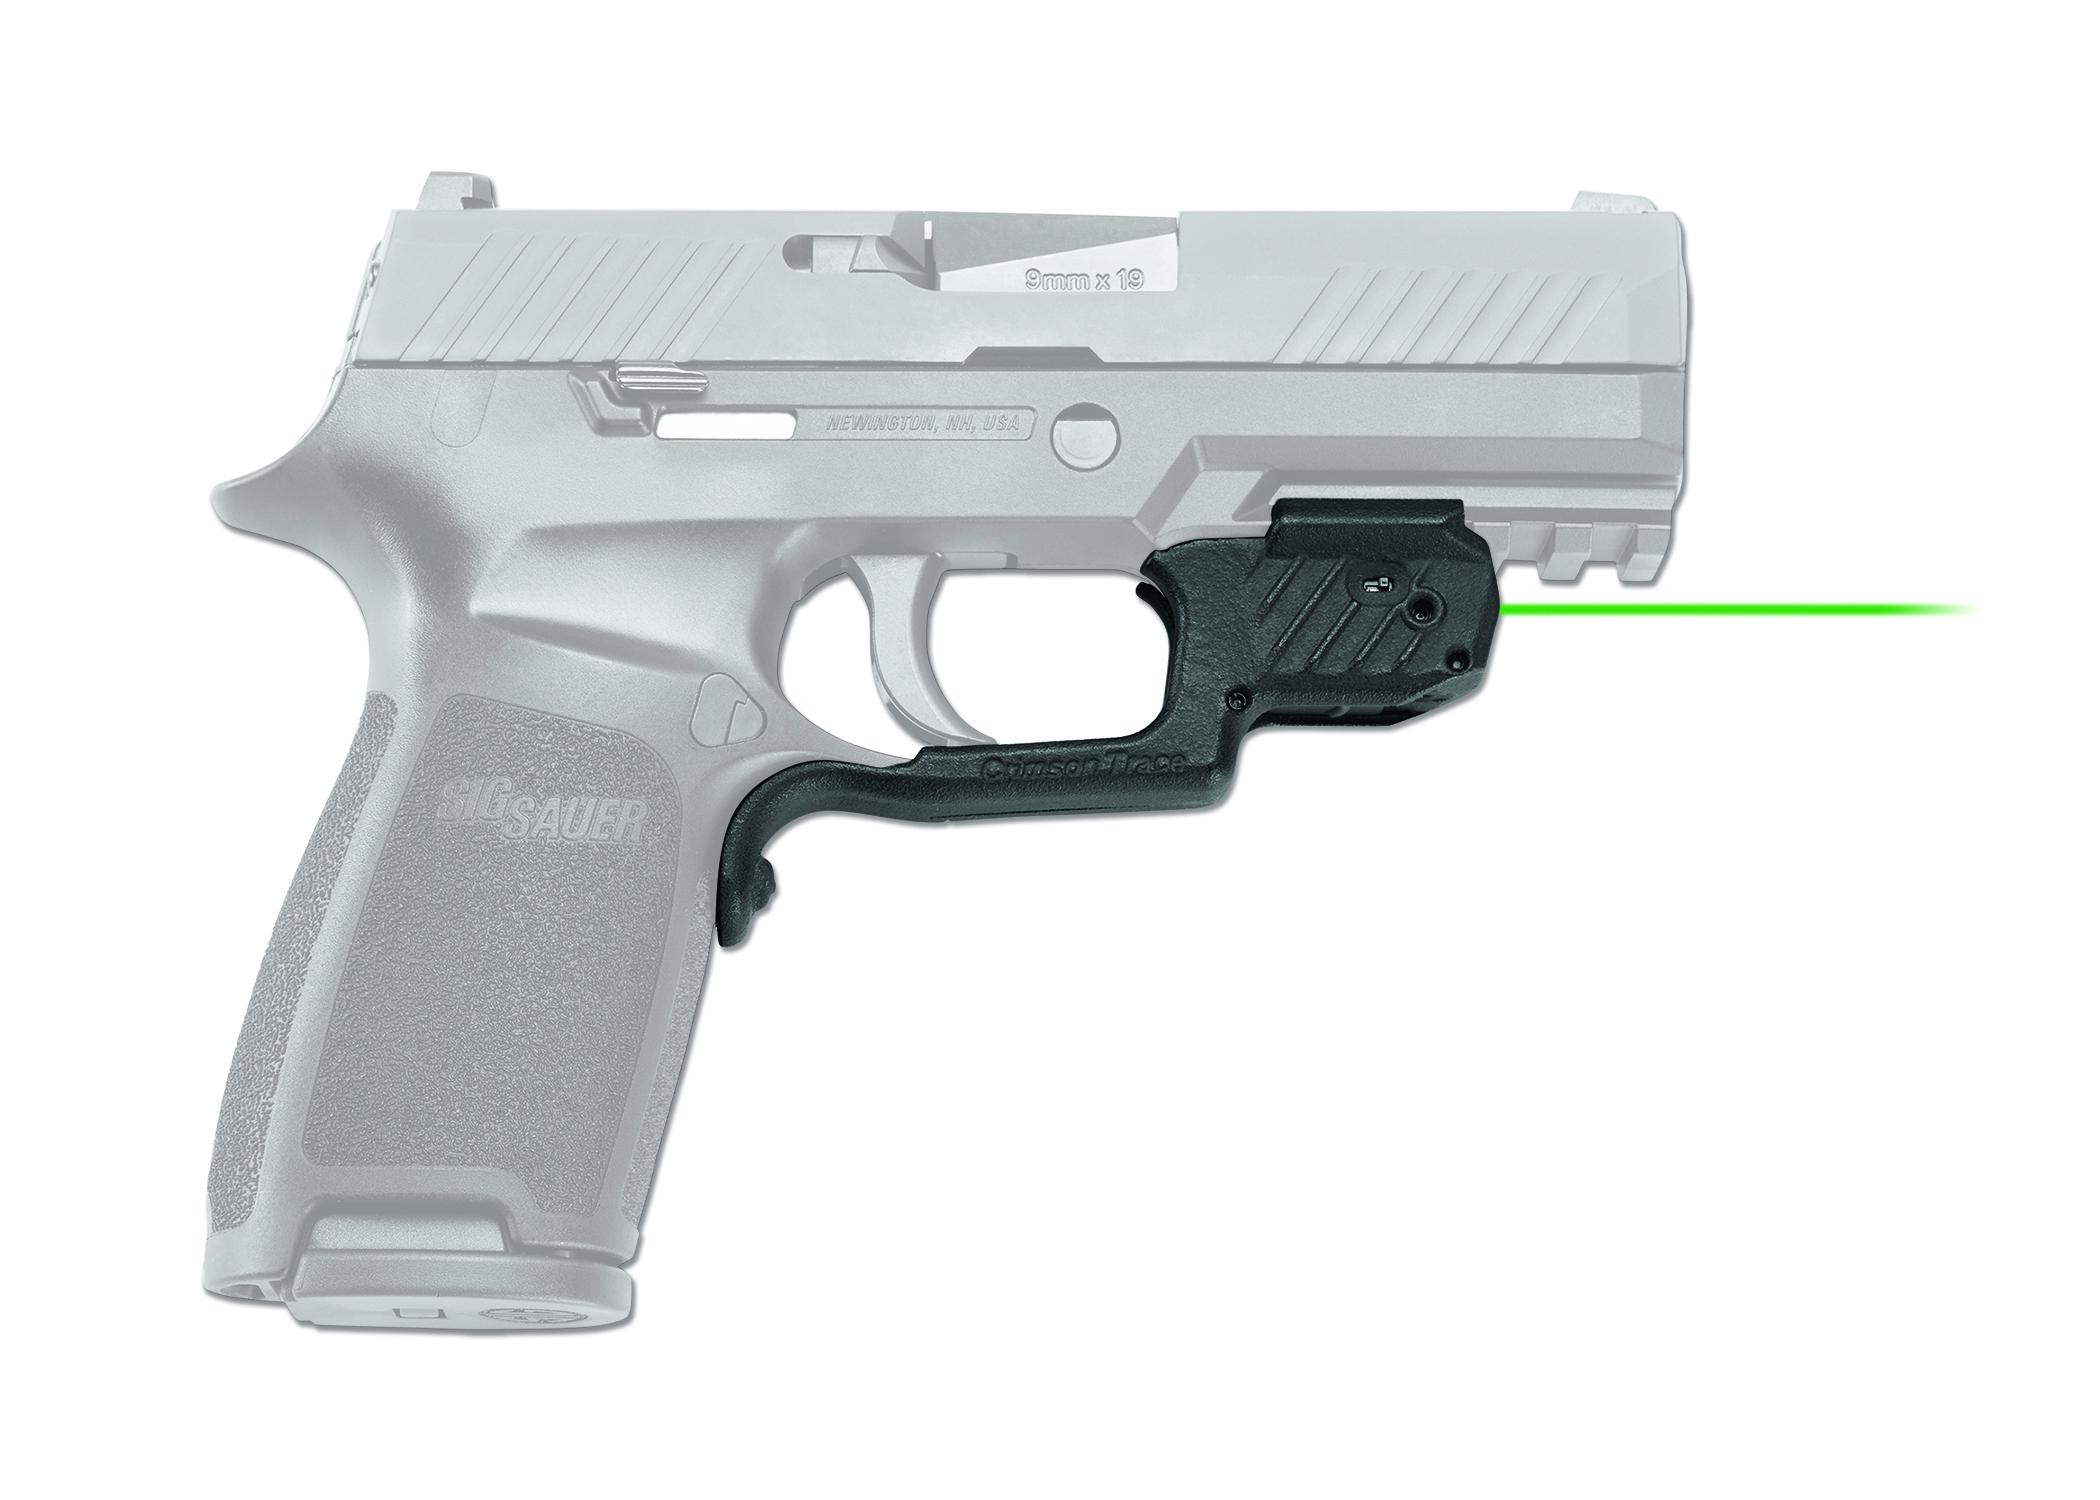 Crimson Trace LG-420 Laserguard, Green Laser Sight For Sig Sauer P320